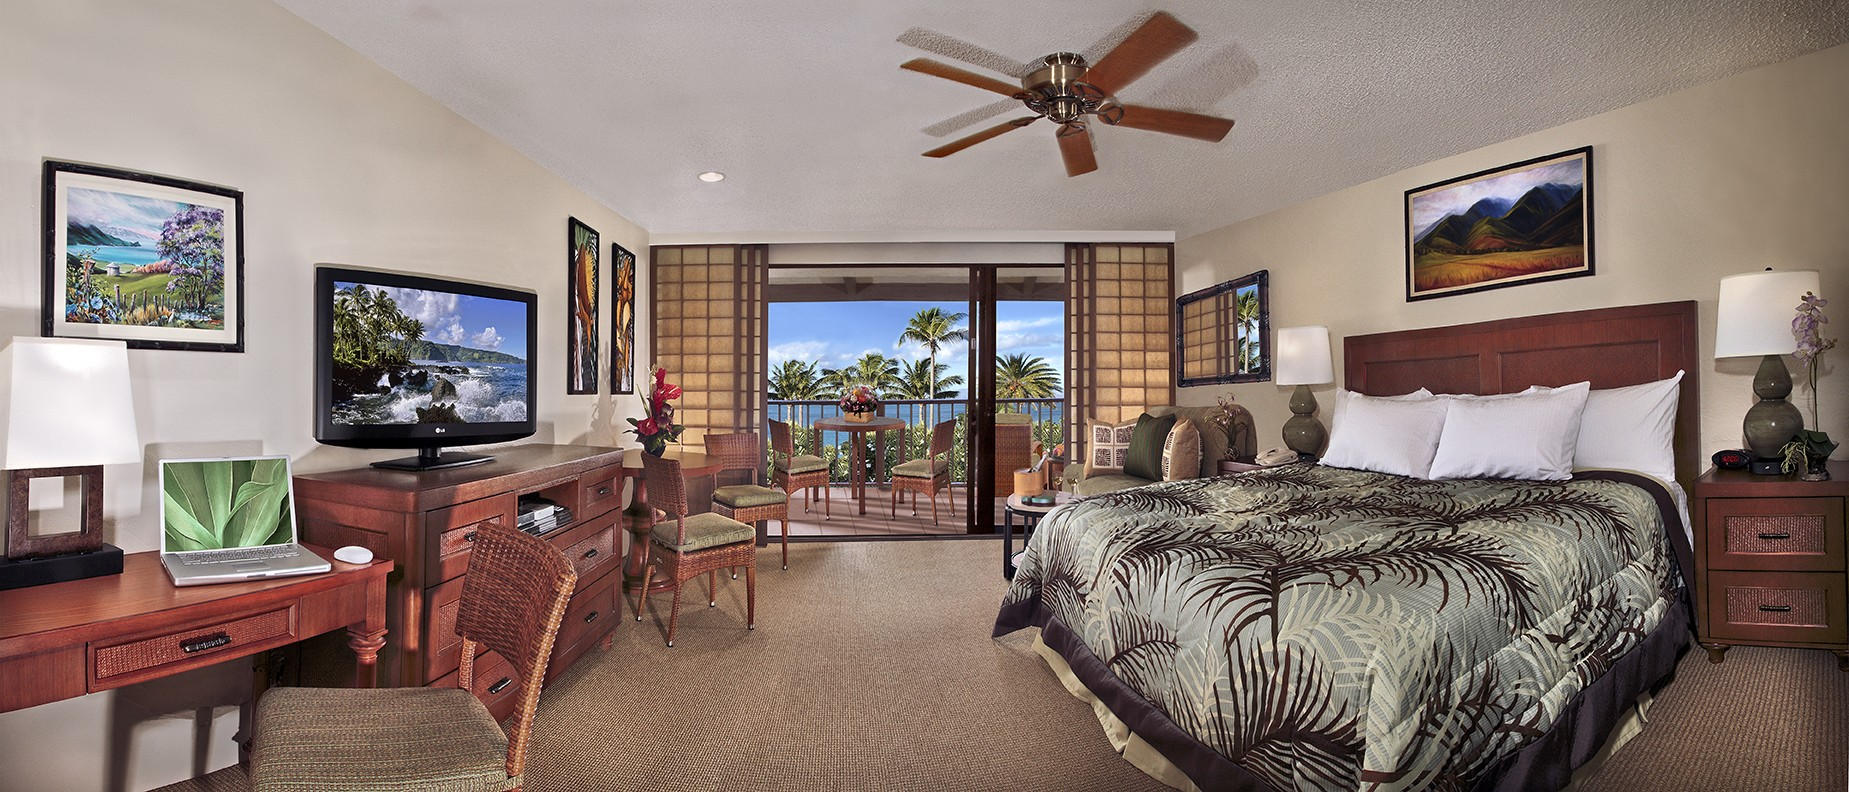 best full size sleeper sofa milo baughman craigslist studio | napili kai beach resort